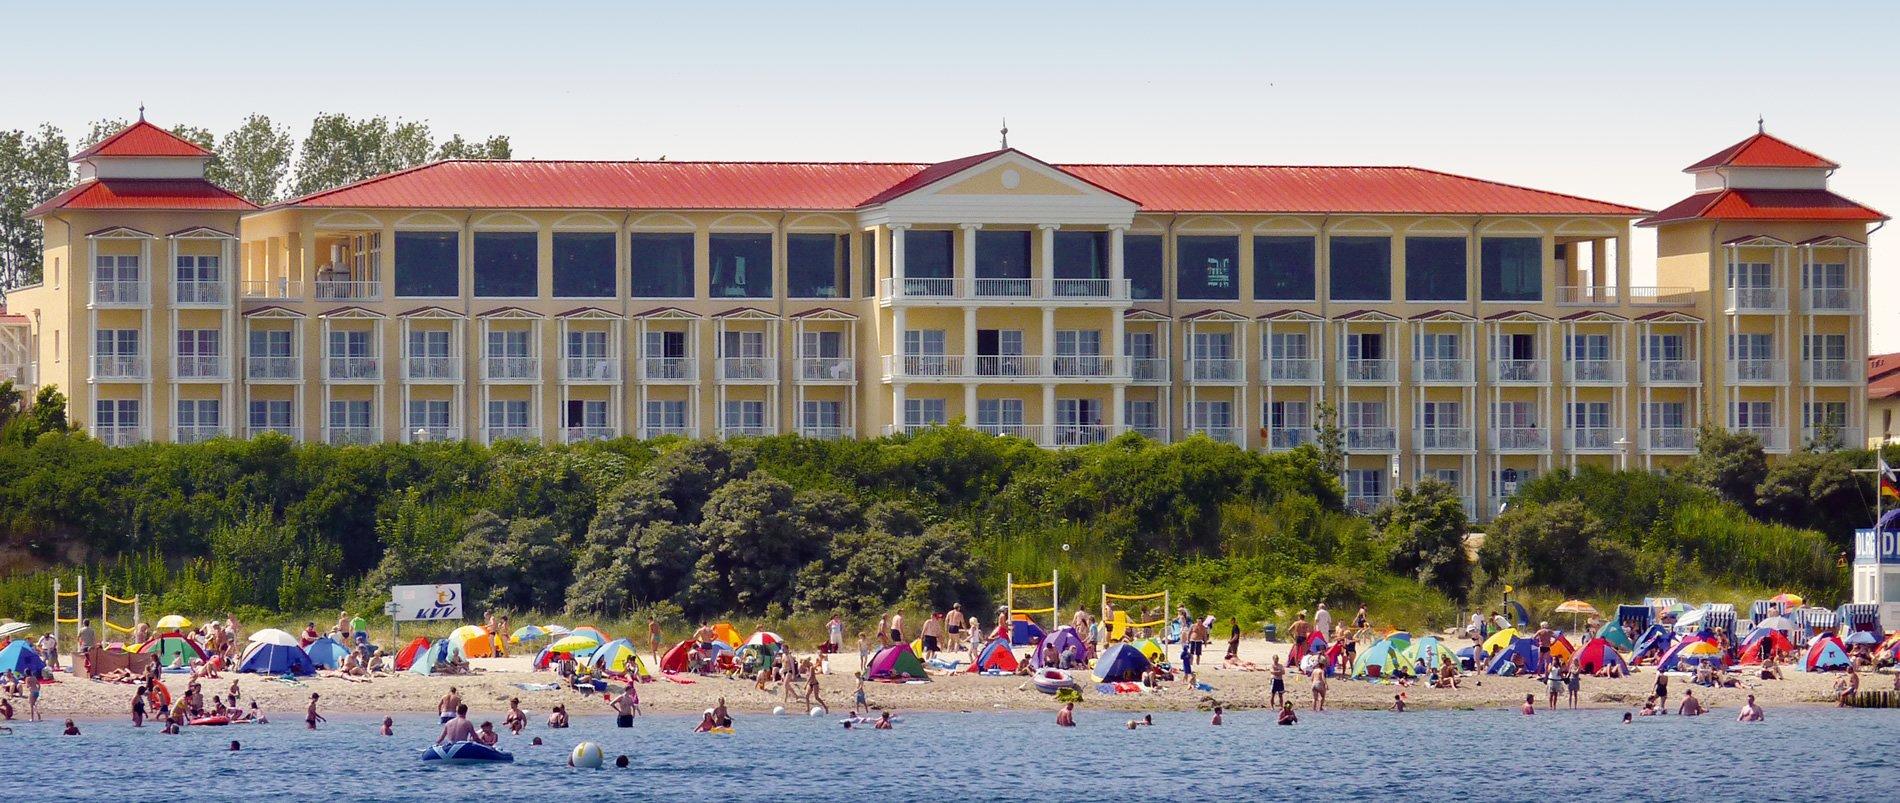 Hotel k hlungsborn morada strandhotel direkt an der ostsee for Designhotel am strand